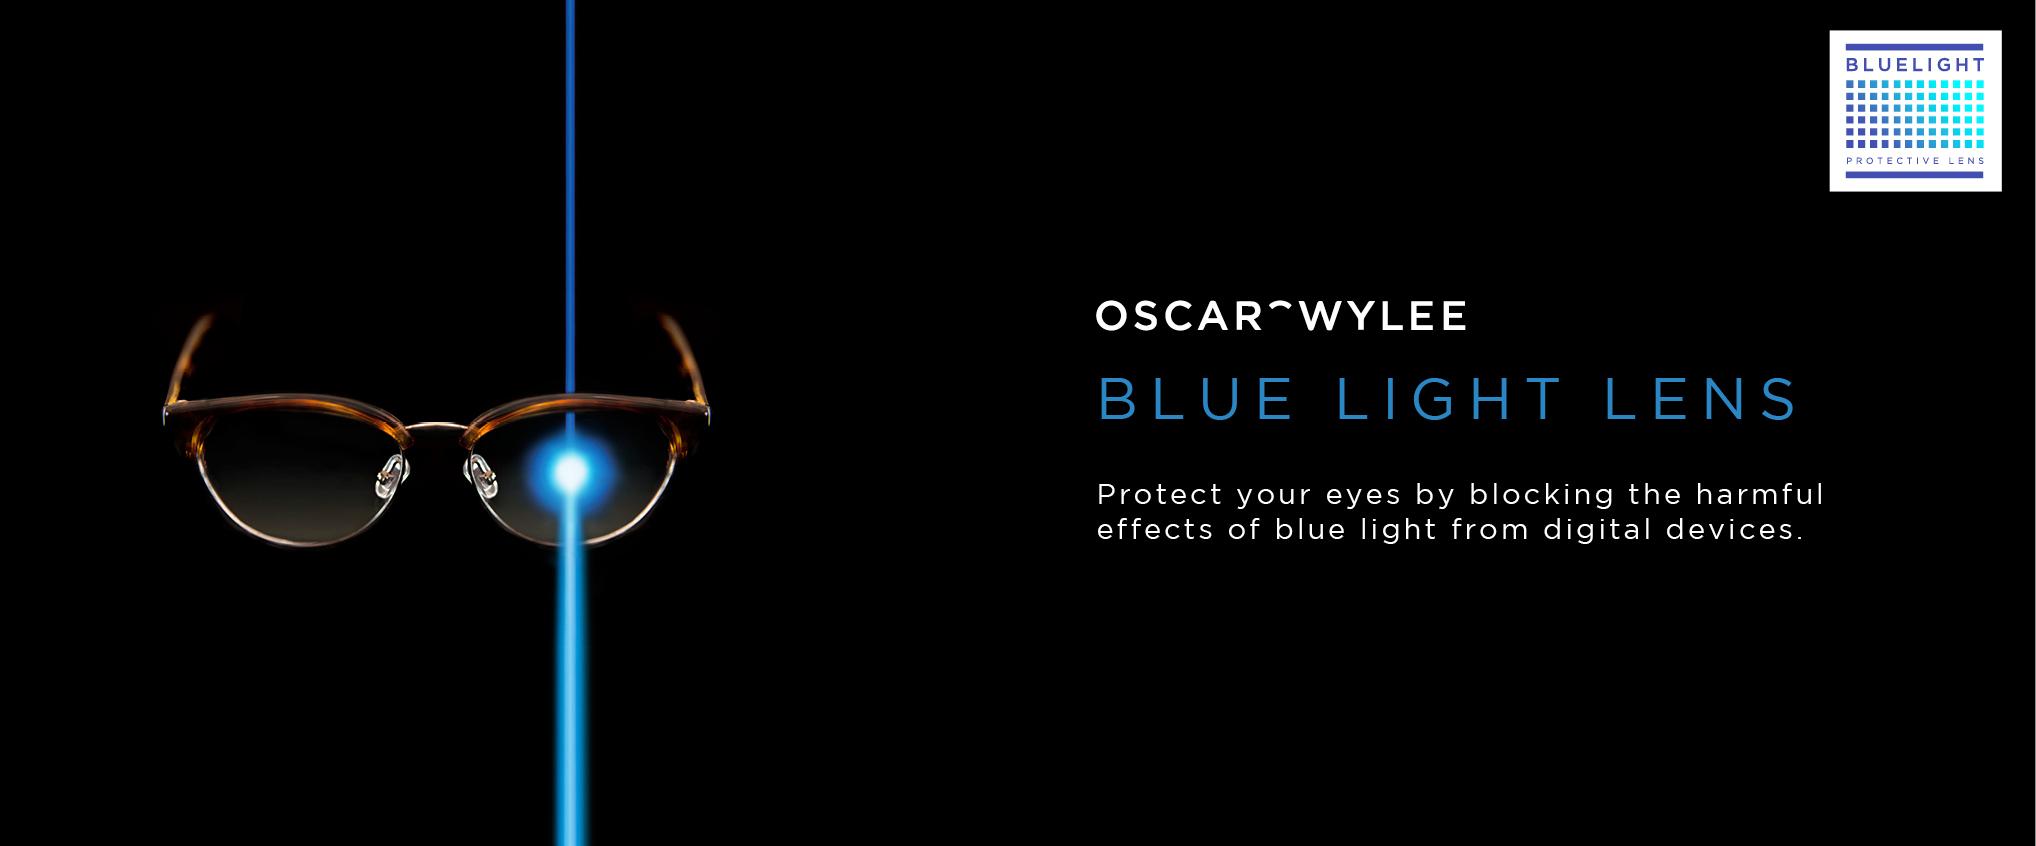 blue light lens oscar wylee